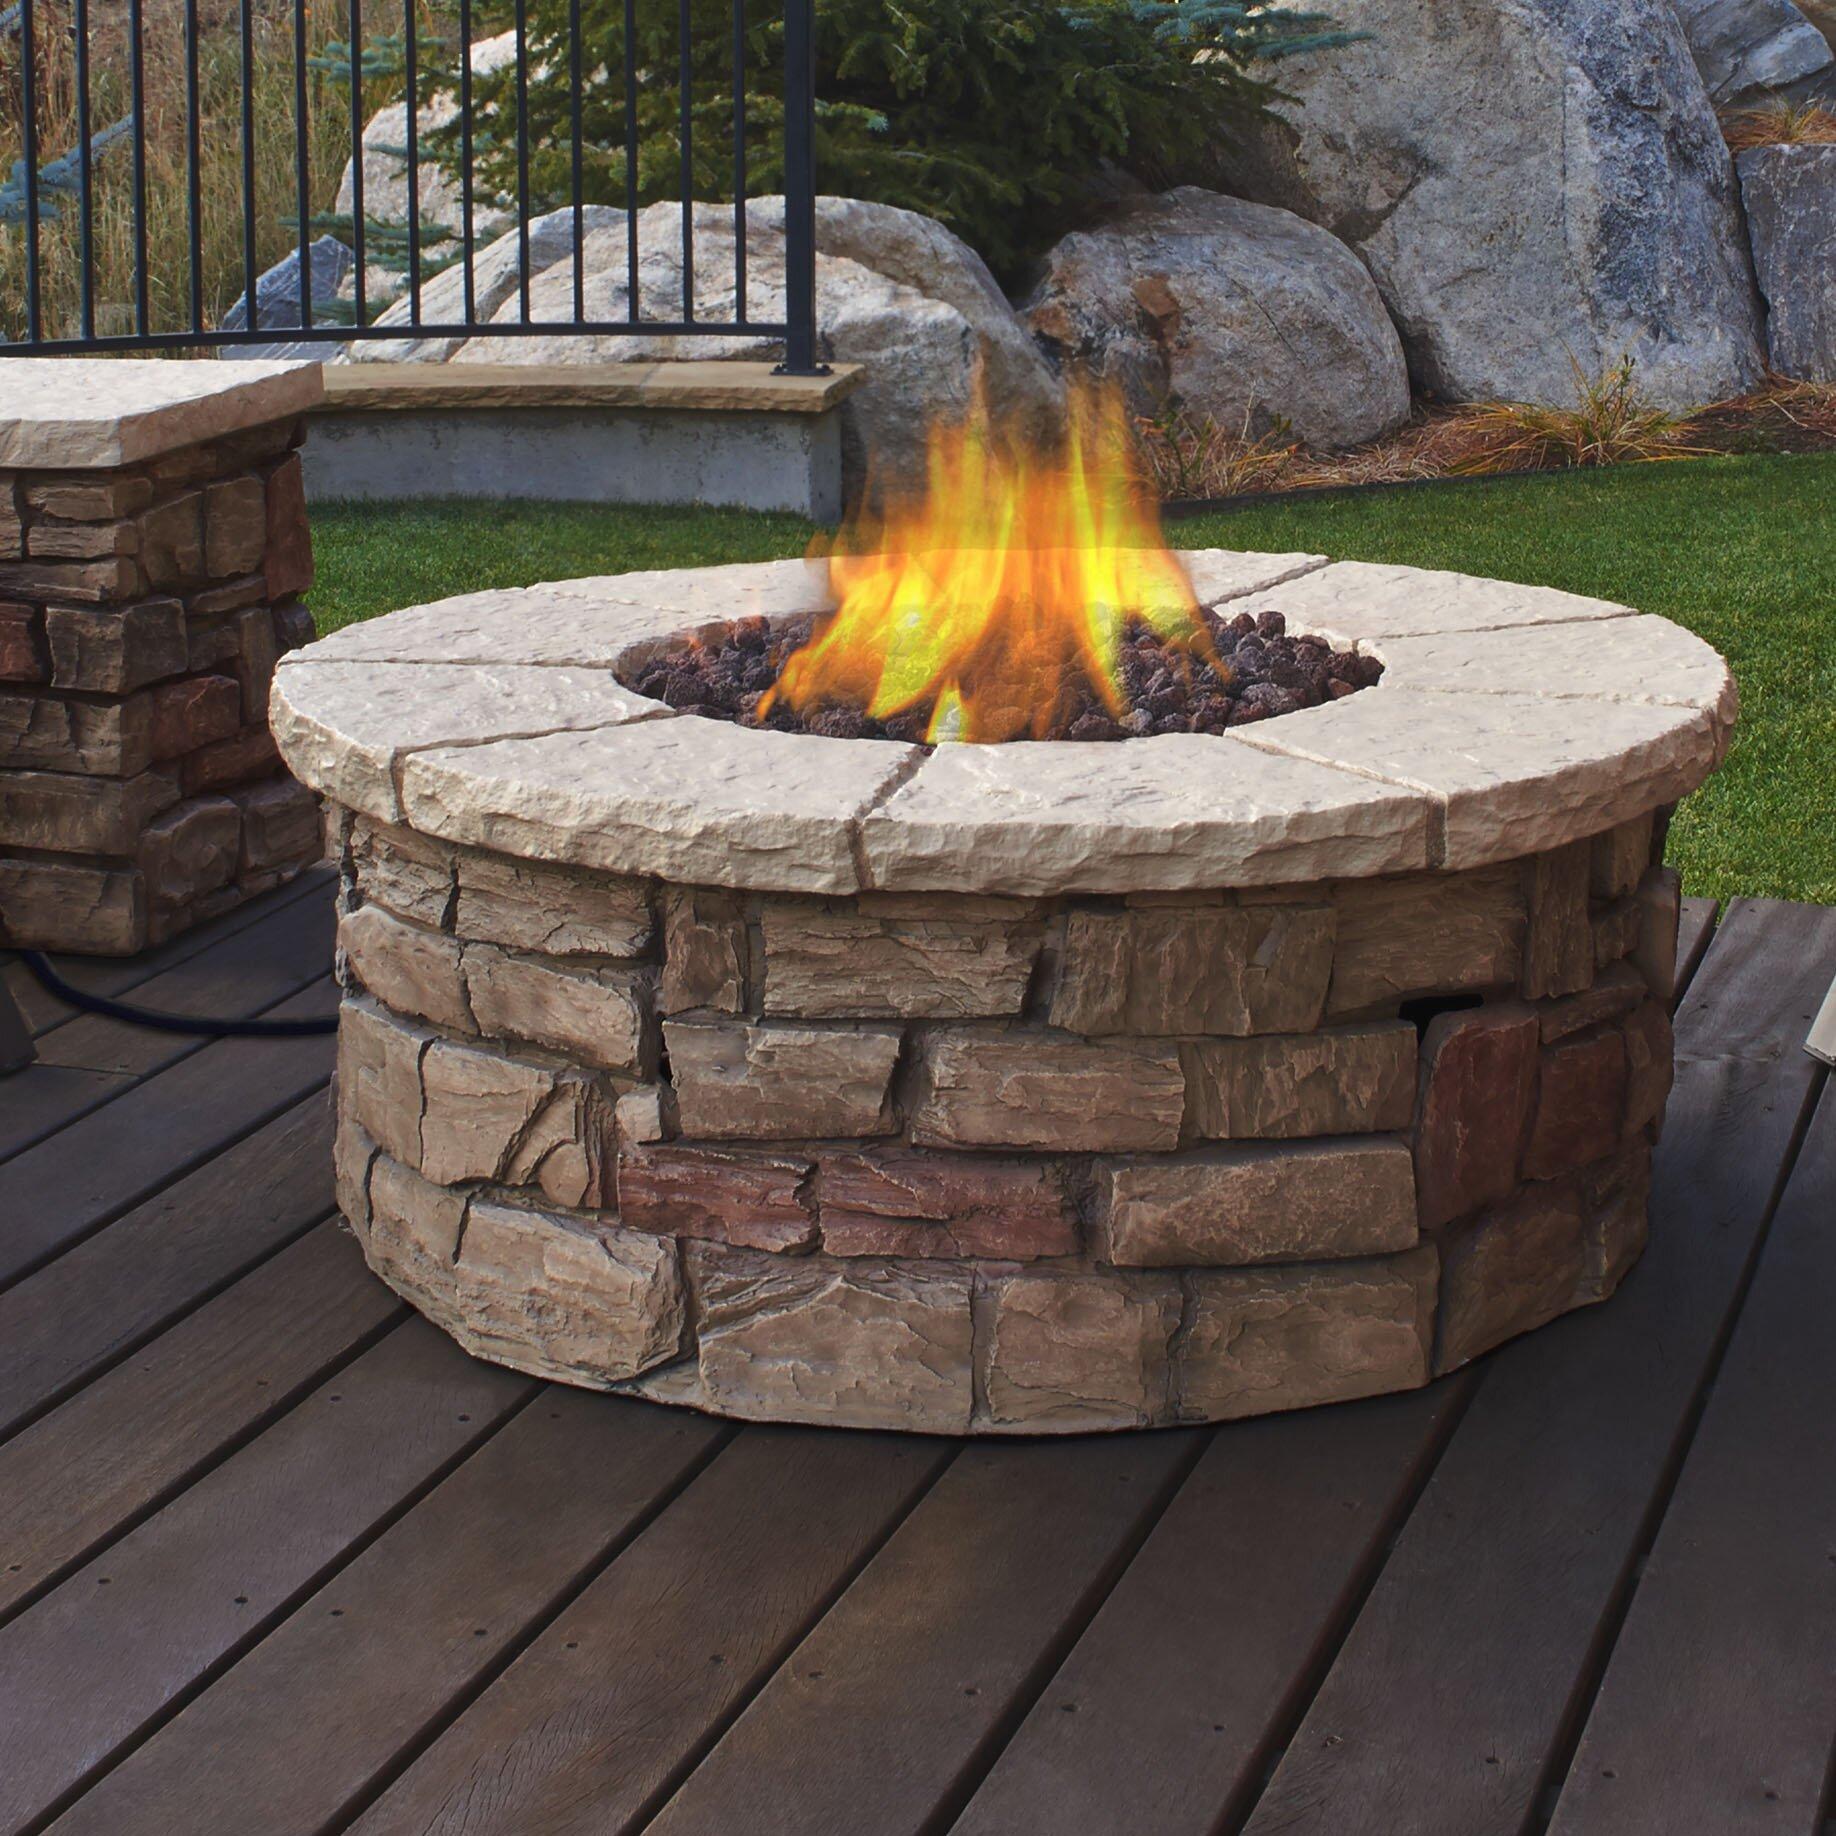 Sedona Fiber Cast Concrete Propane Outdoor Fireplace Wayfair Supply